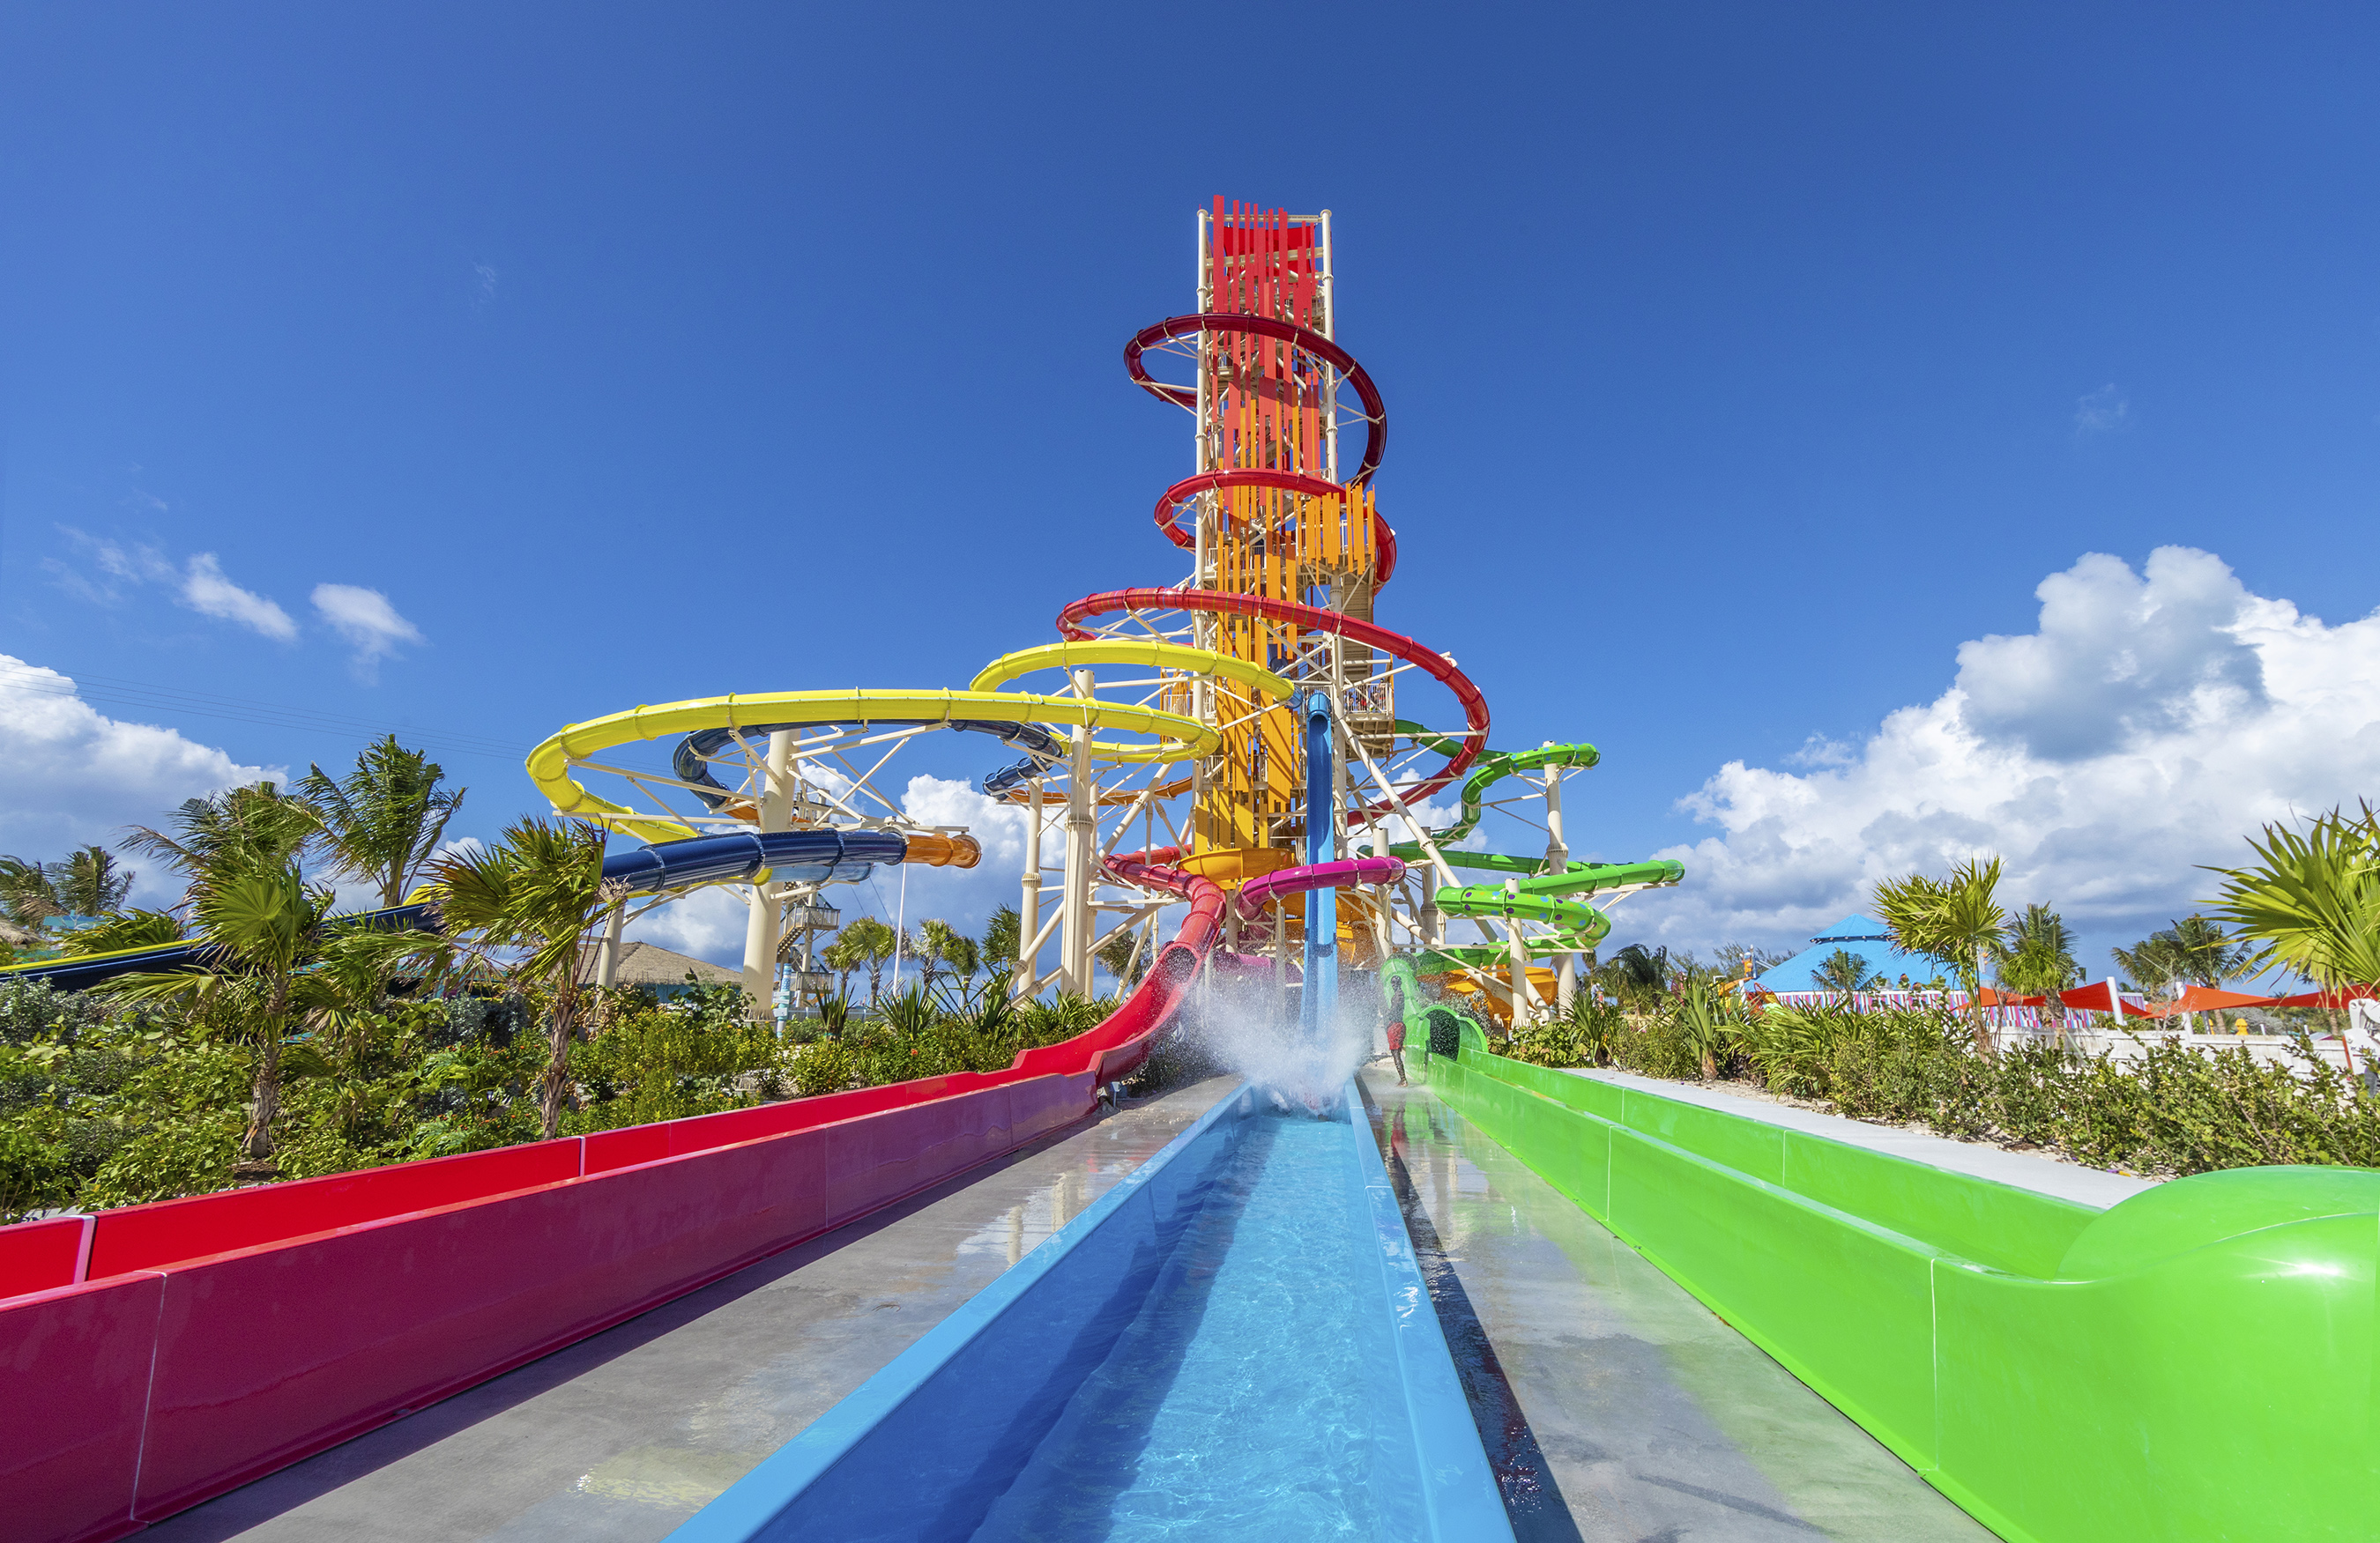 Thrill Waterpark